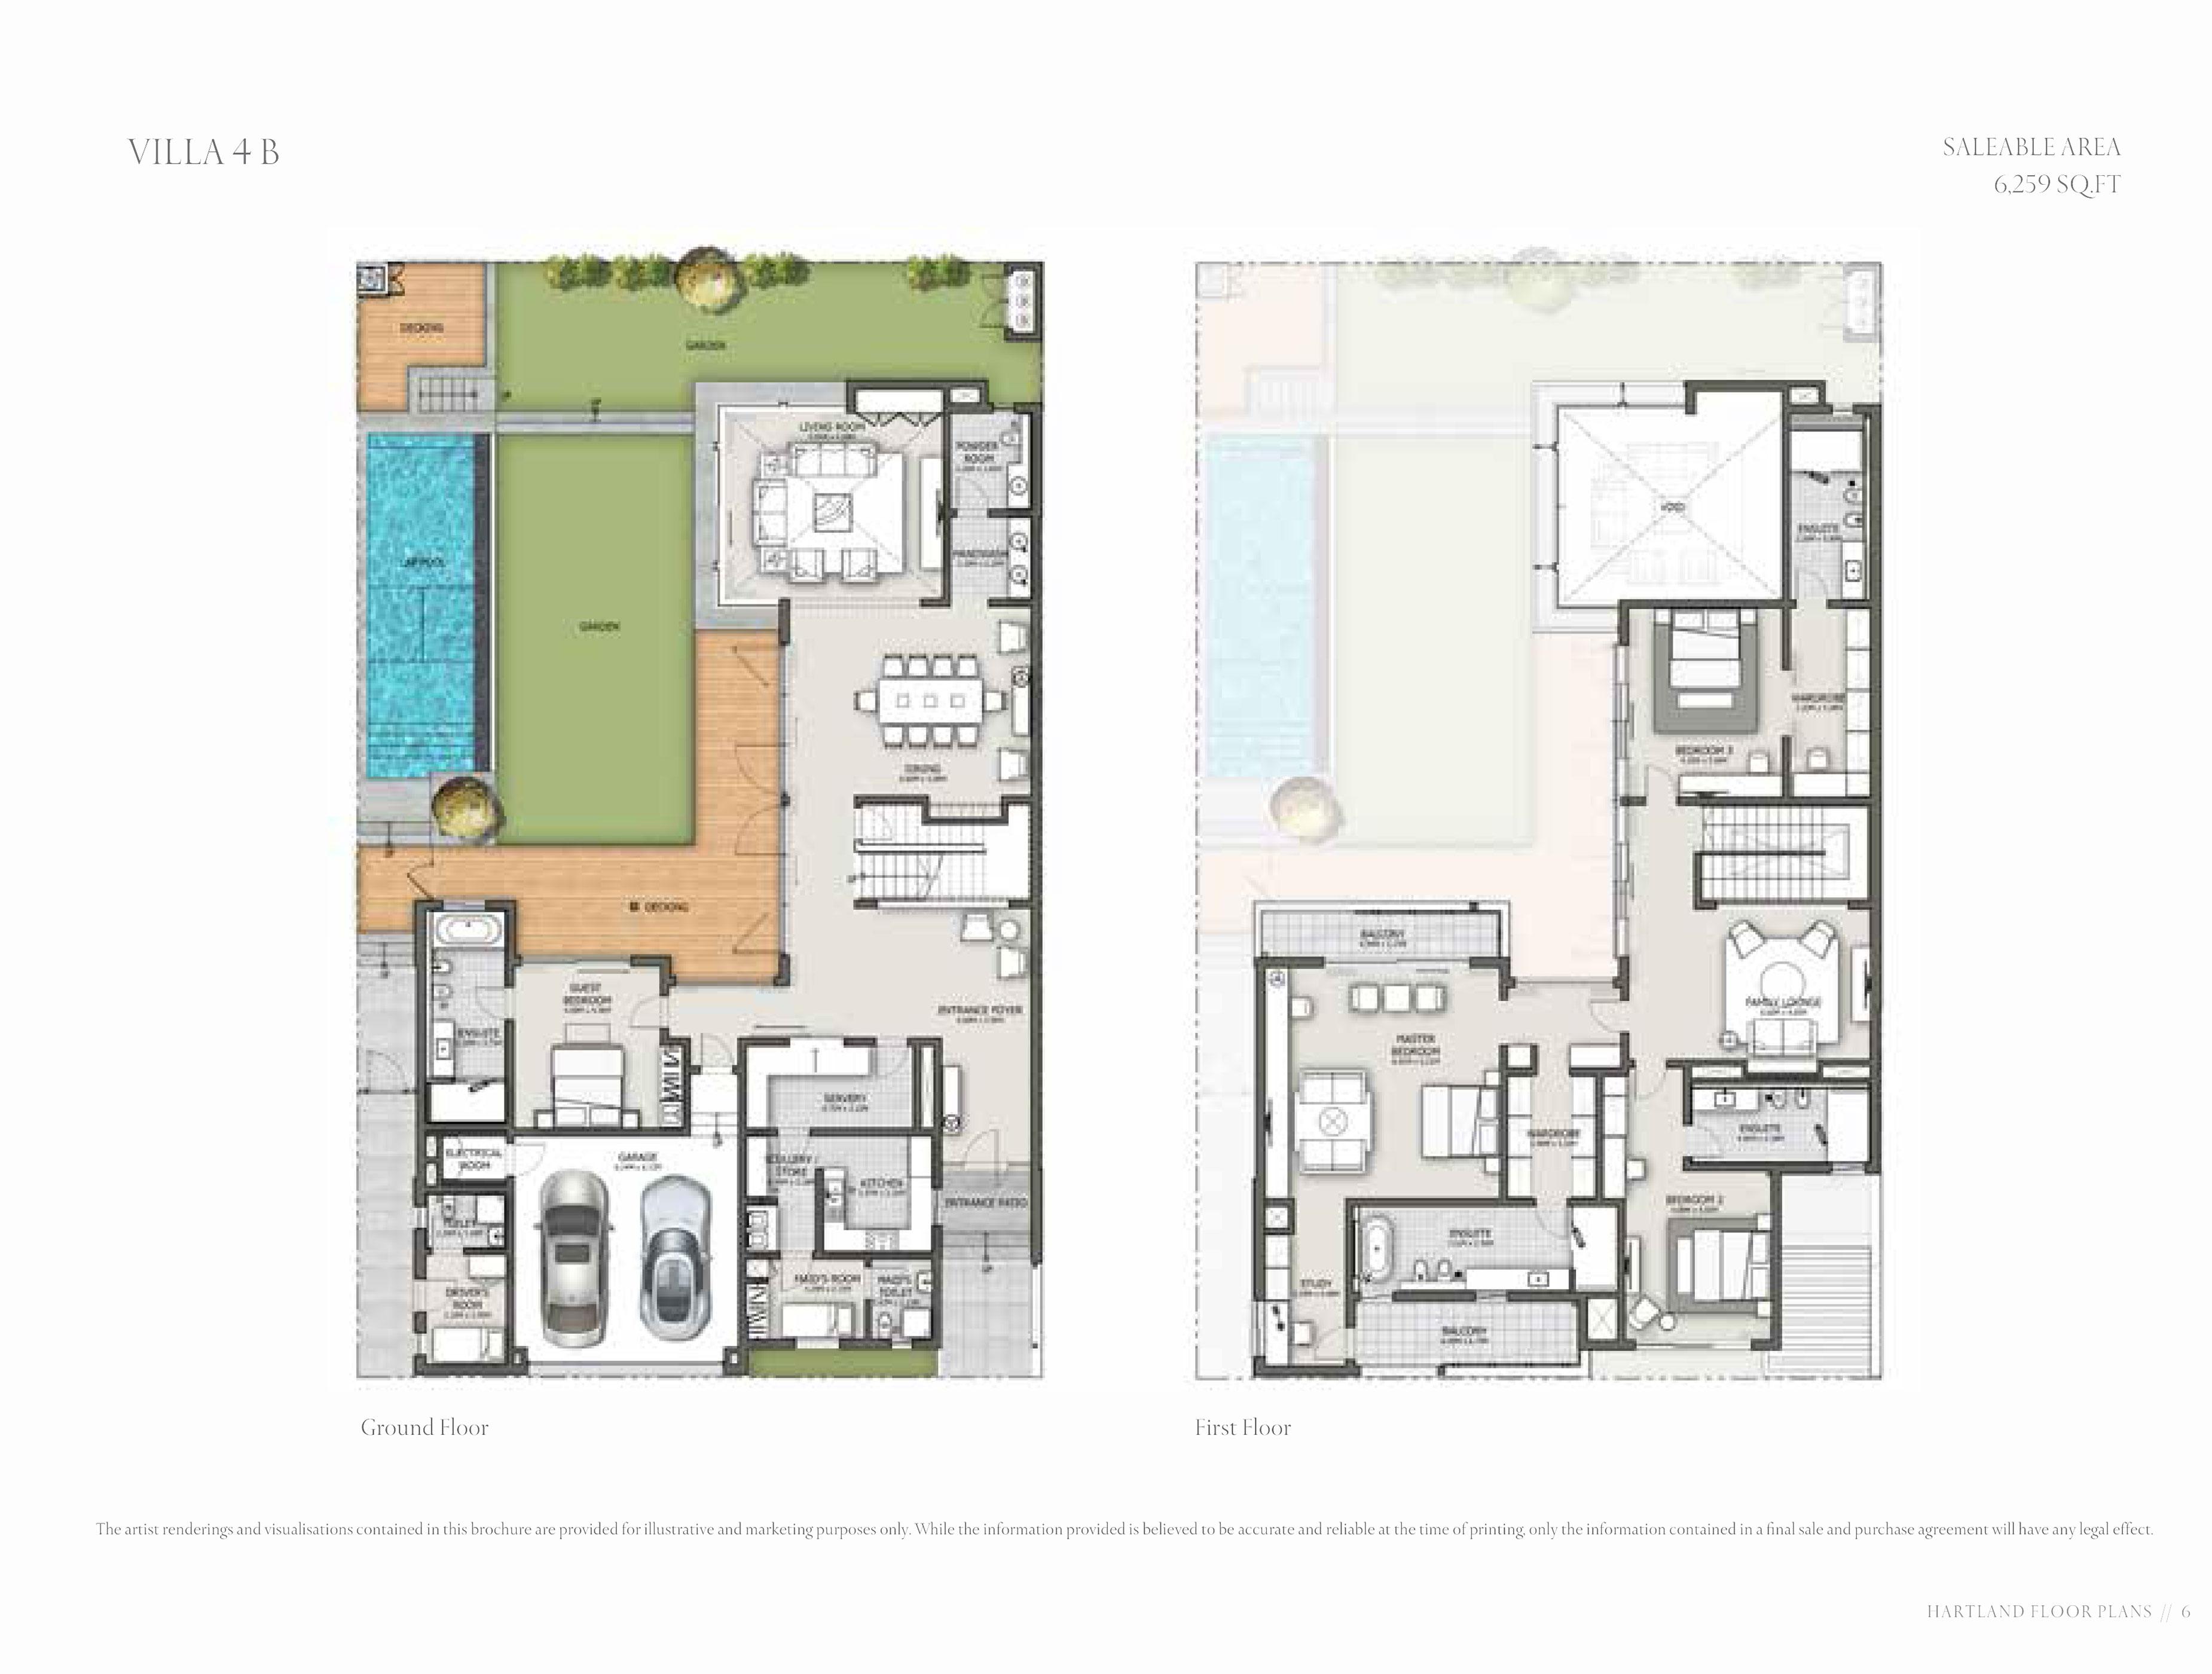 Villas-4B-Area-6259